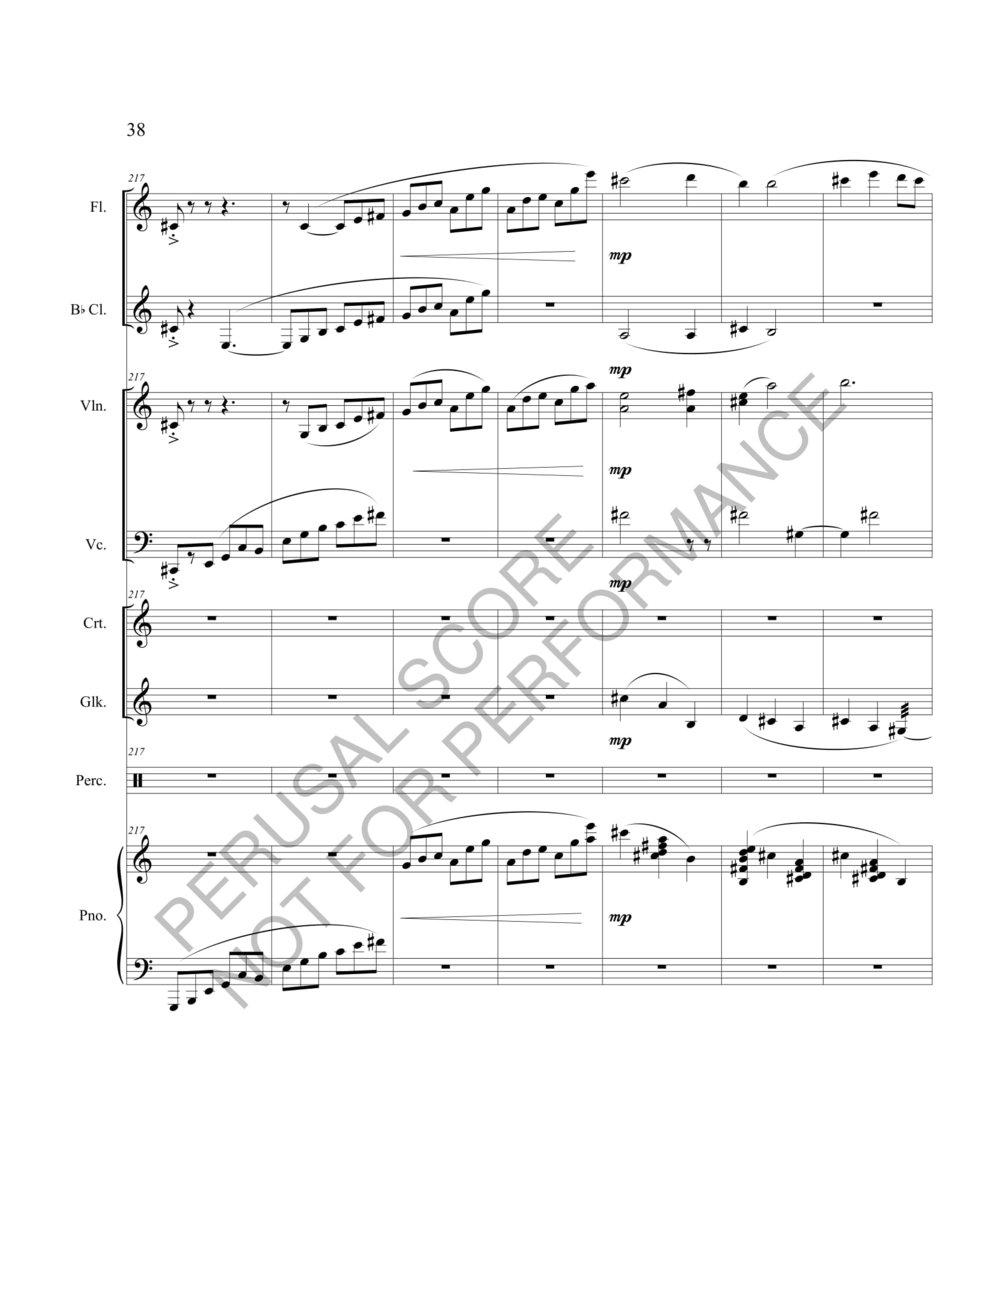 Boyd Terra Liberi Score-watermark-44.jpg